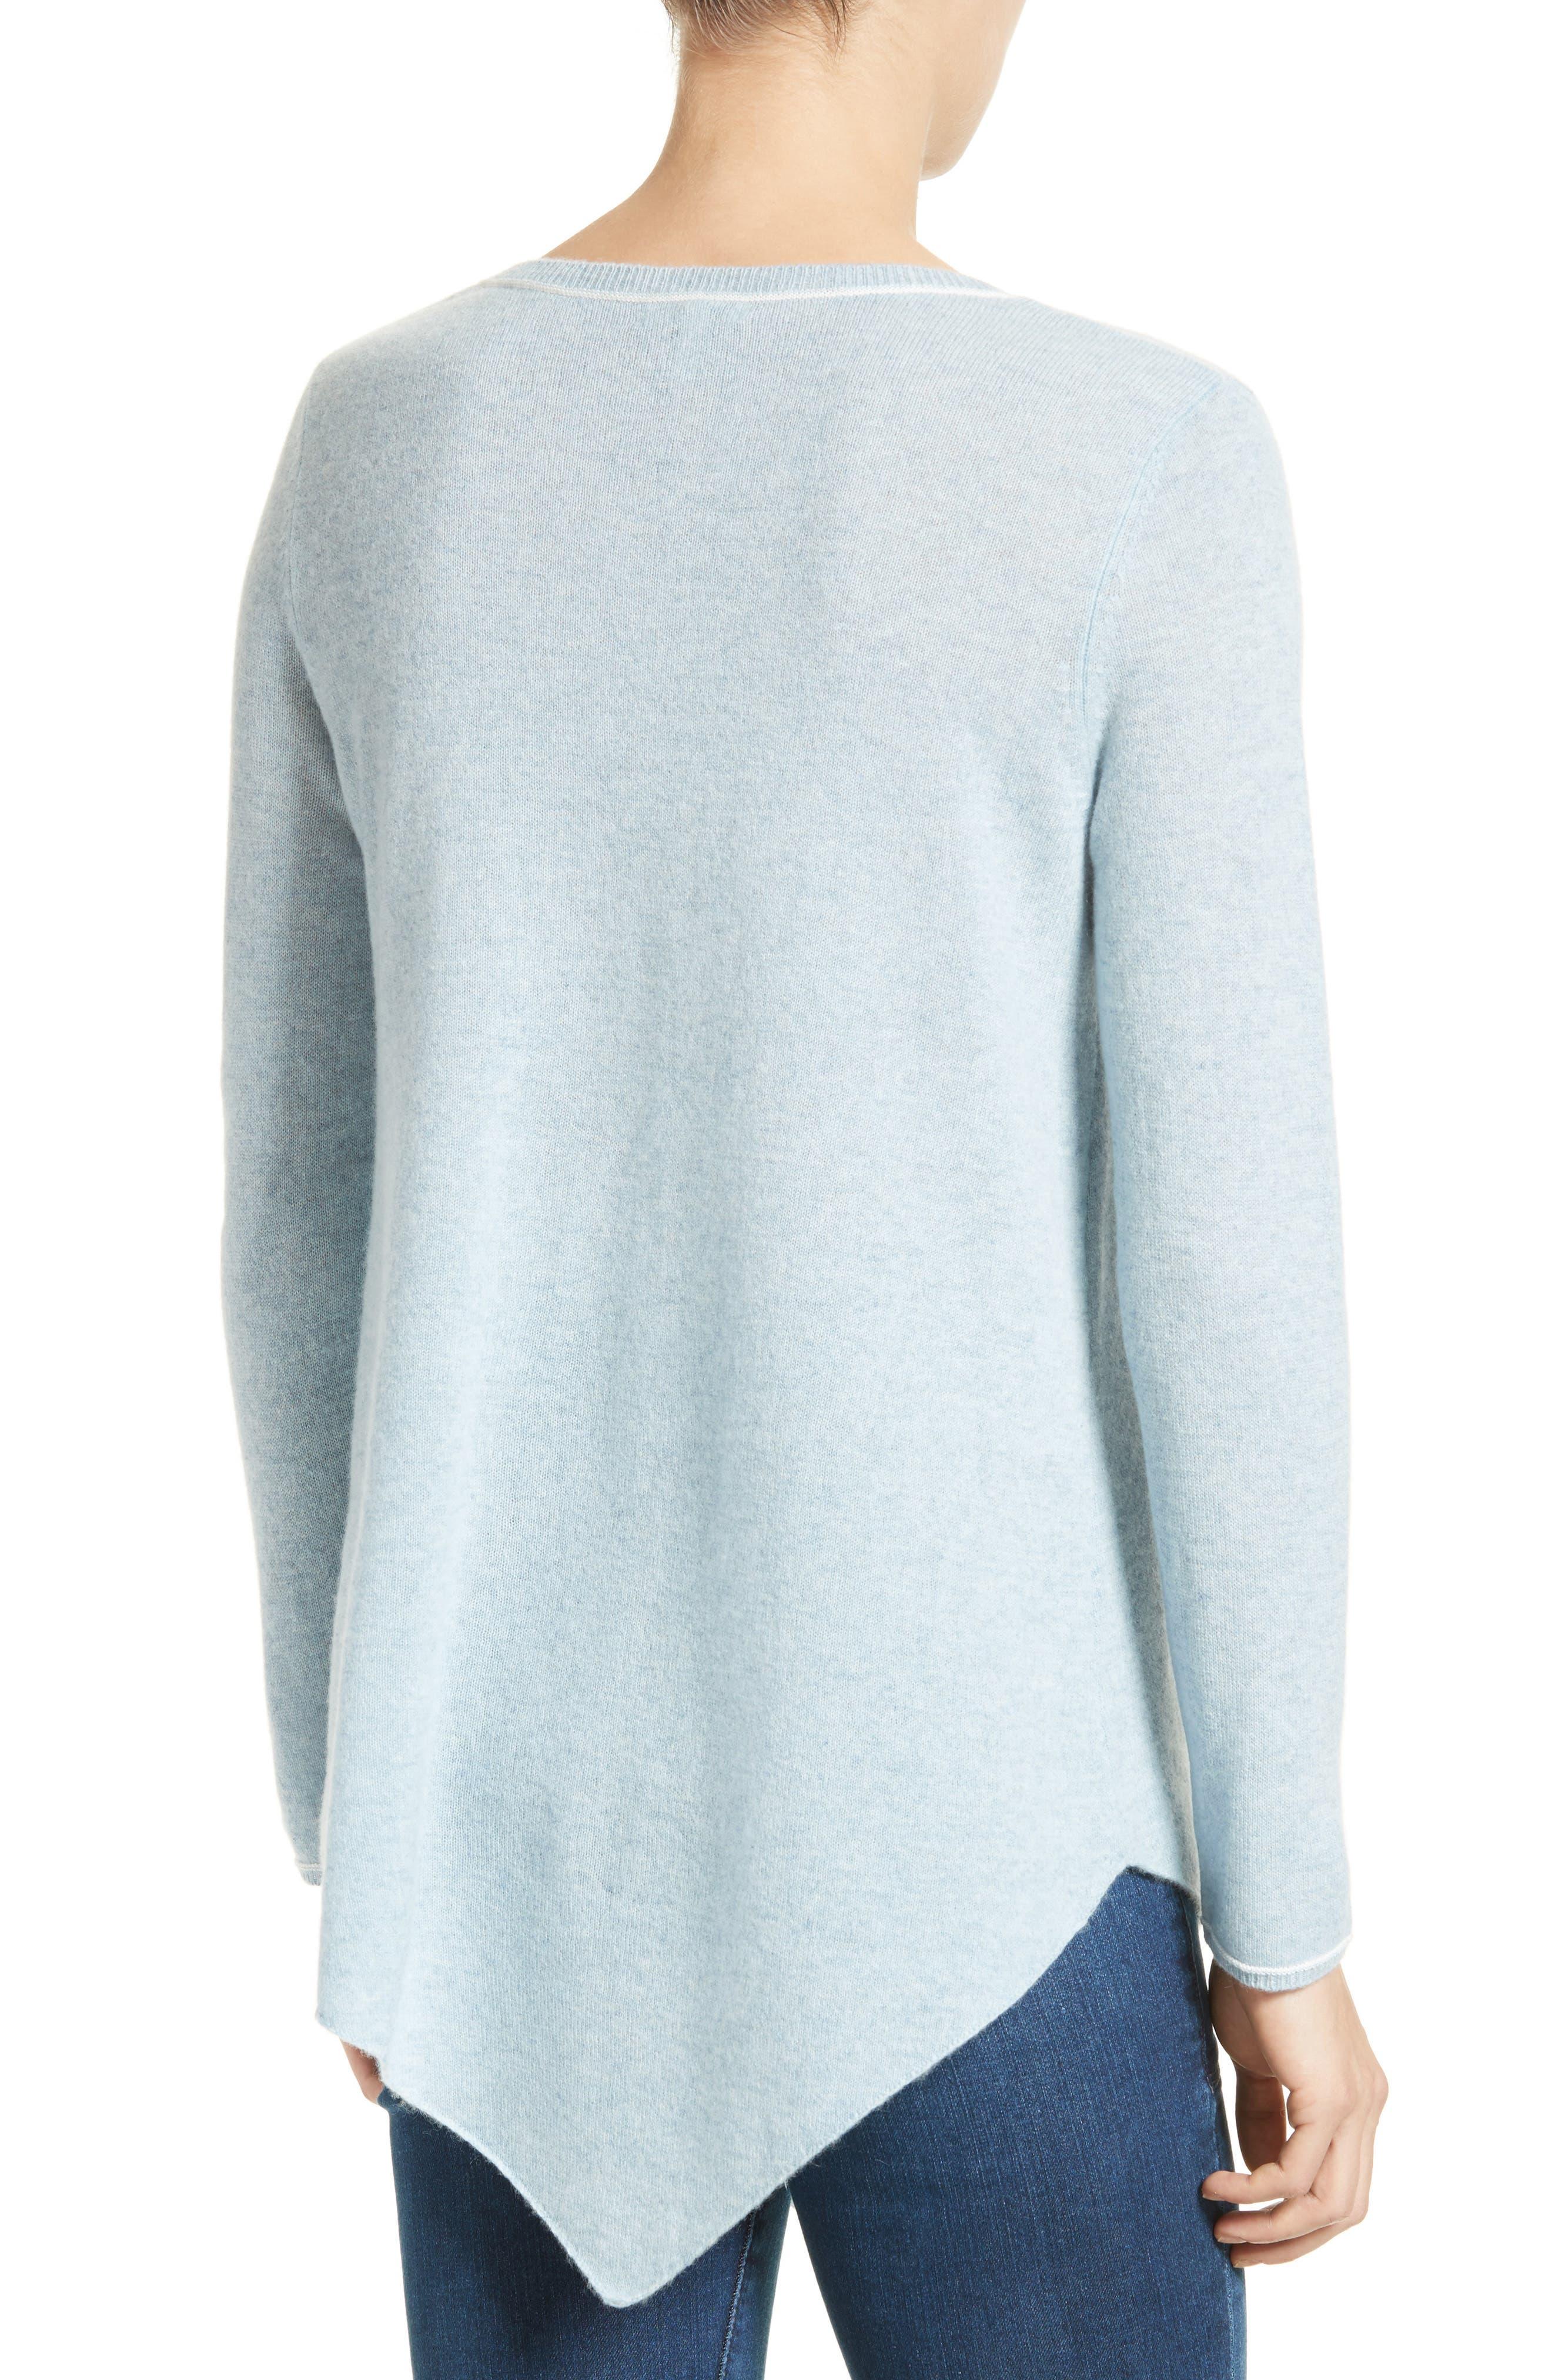 Tambrel H Asymmetrical Hem Cashmere Sweater,                             Alternate thumbnail 2, color,                             400